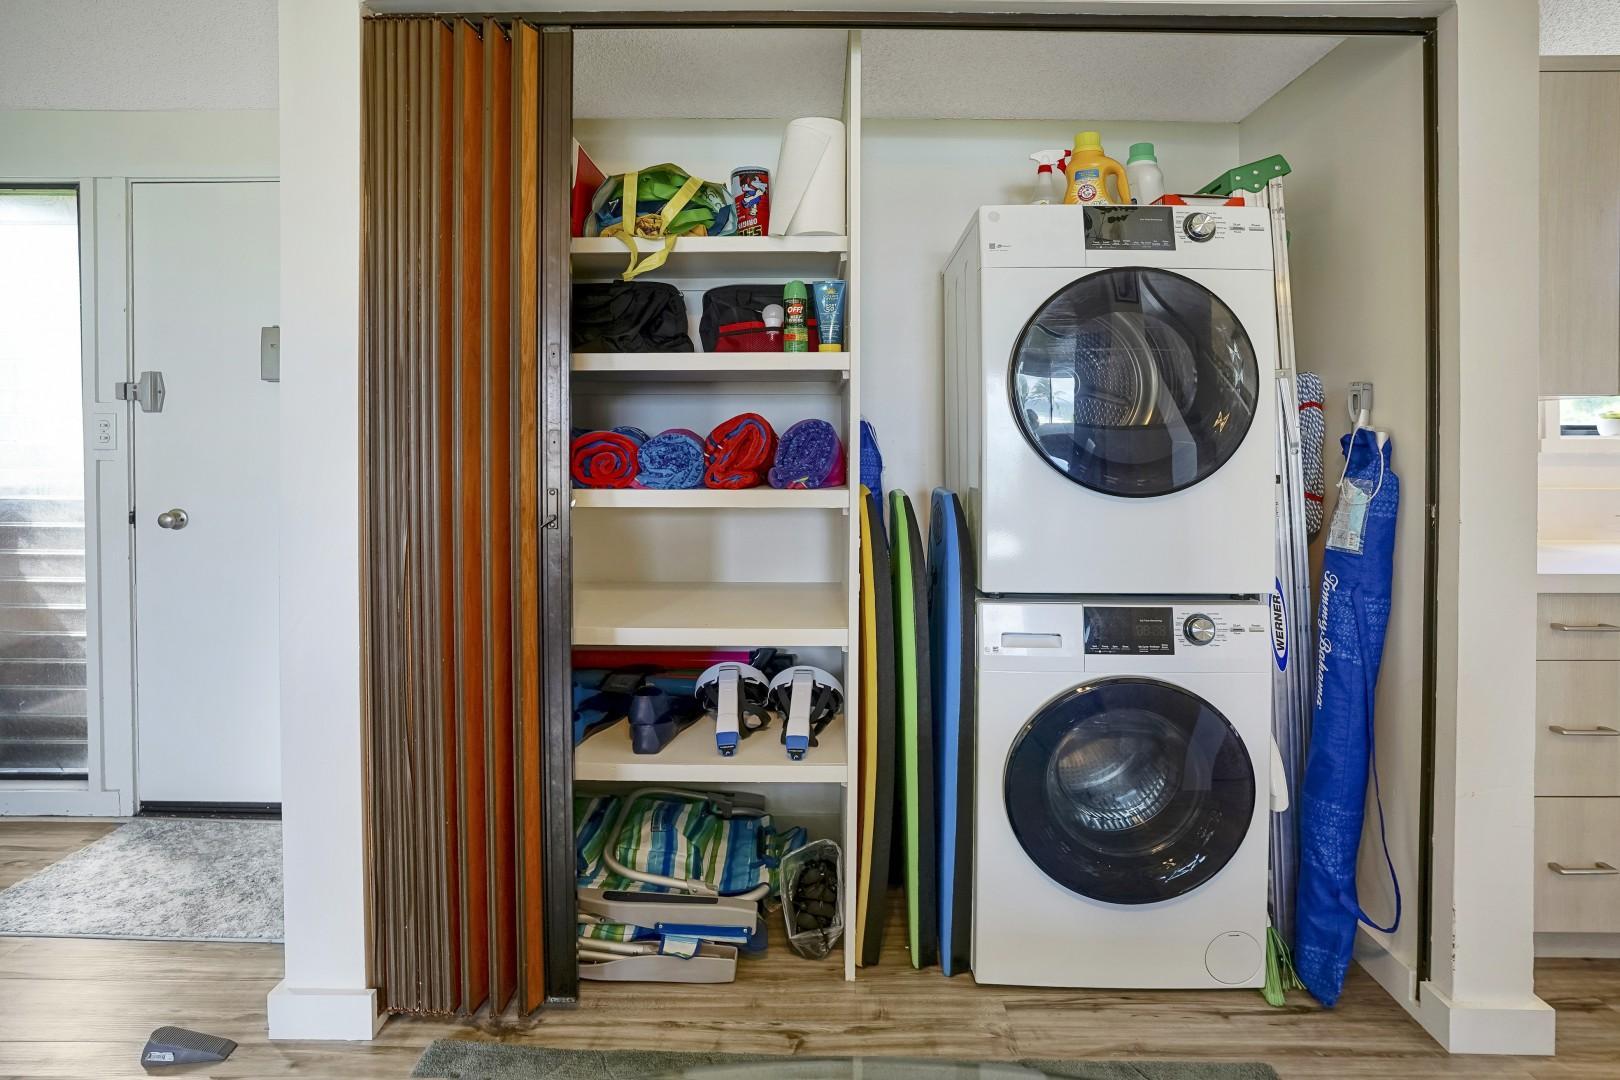 Indoor washer and dryer